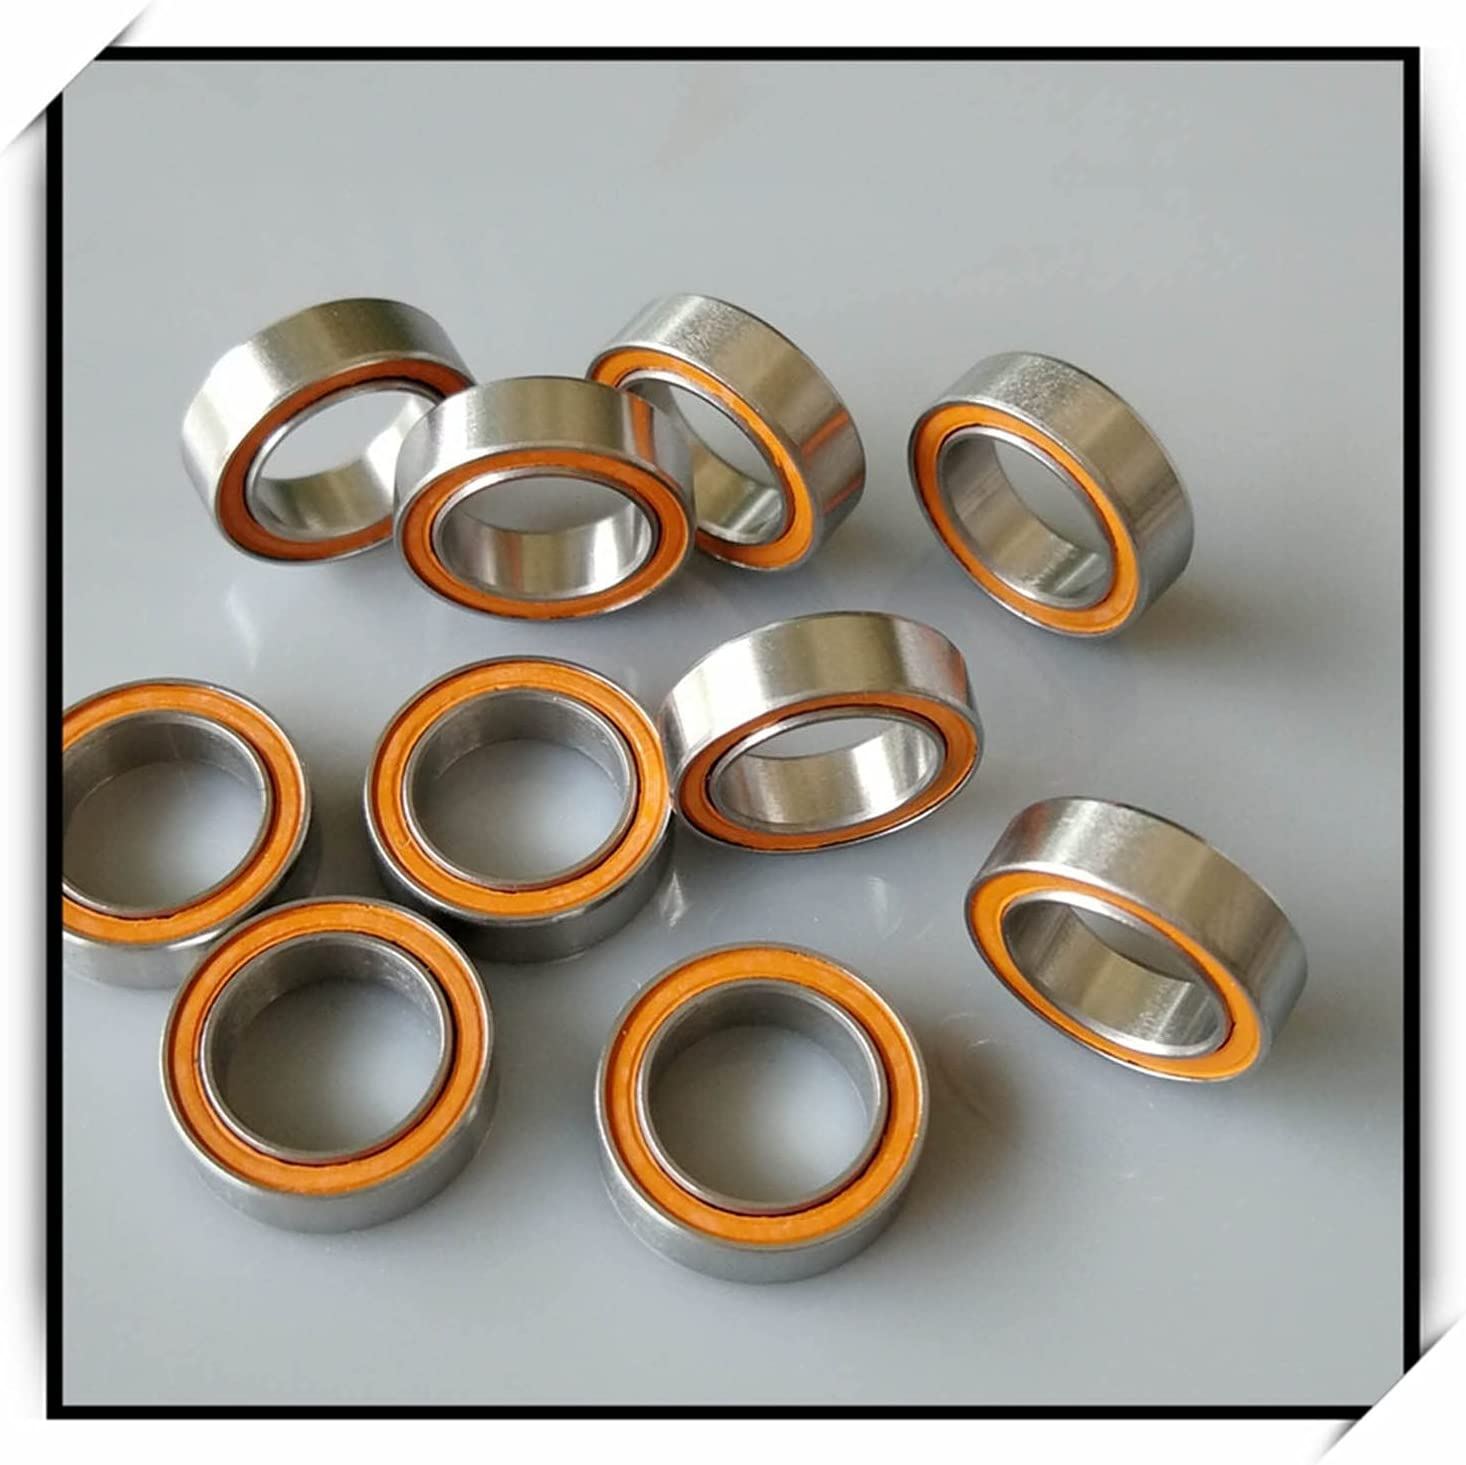 MING-BIN Bearing Tool Accessories Ceramic Lot Ultra-Cheap Deals 1Pcs Max 46% OFF 3Pcs